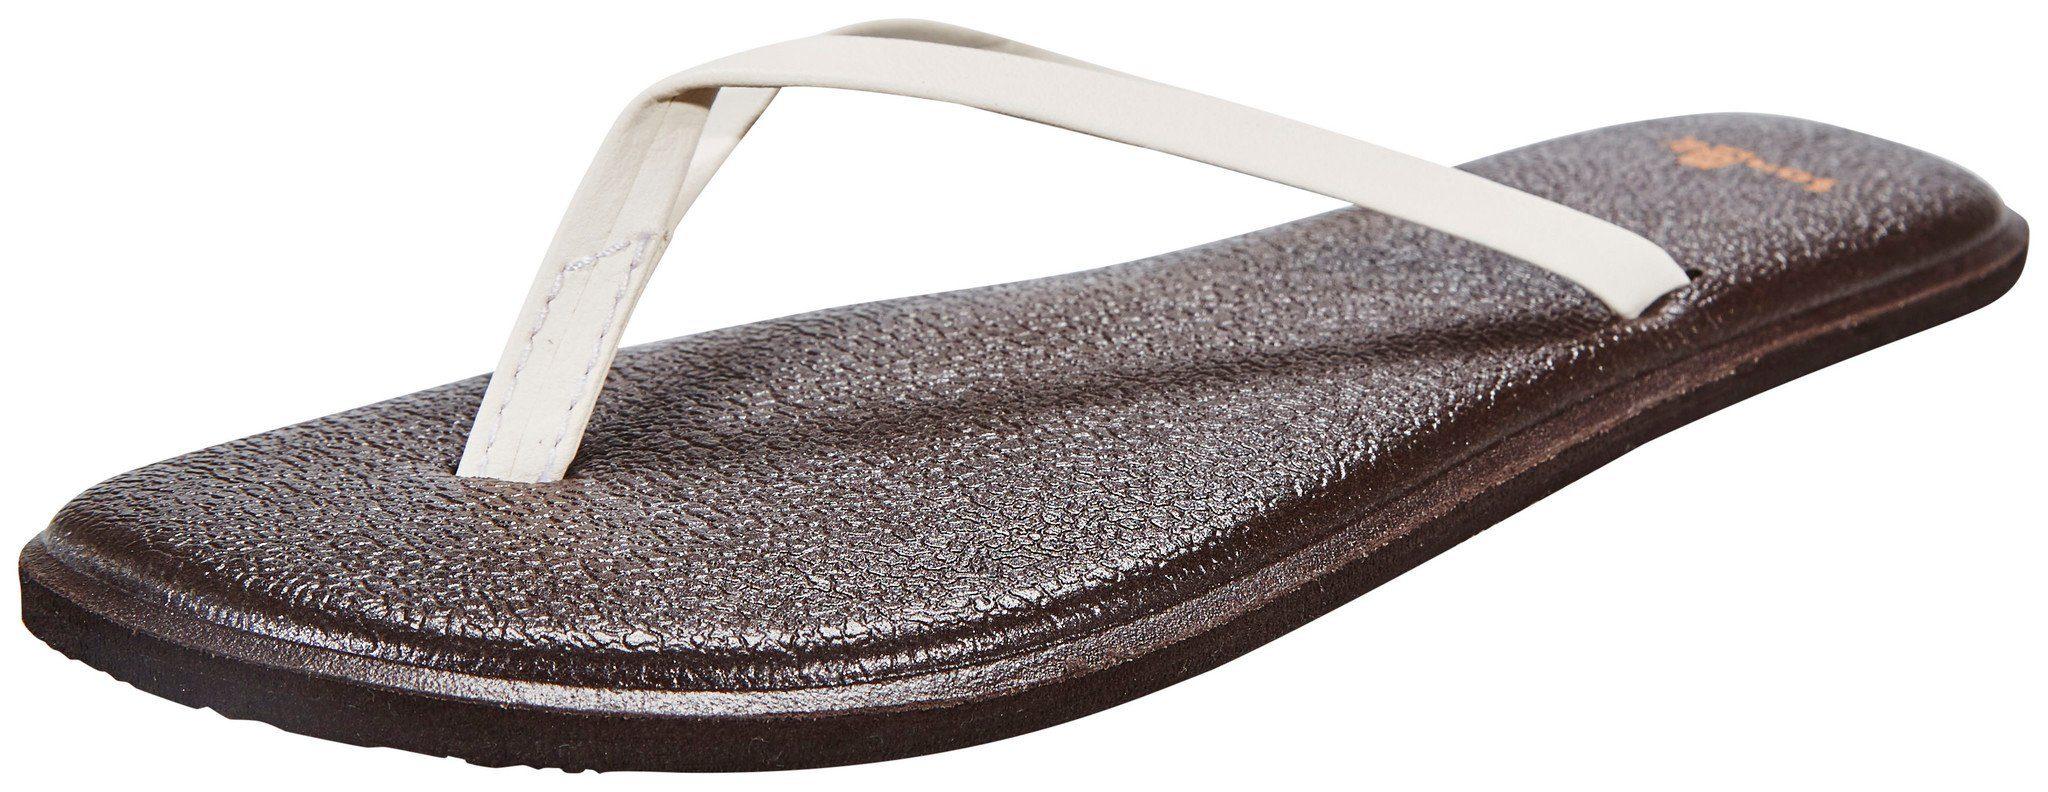 Sanük Sandale Yoga Bliss Shoes Women kaufen  schwarz